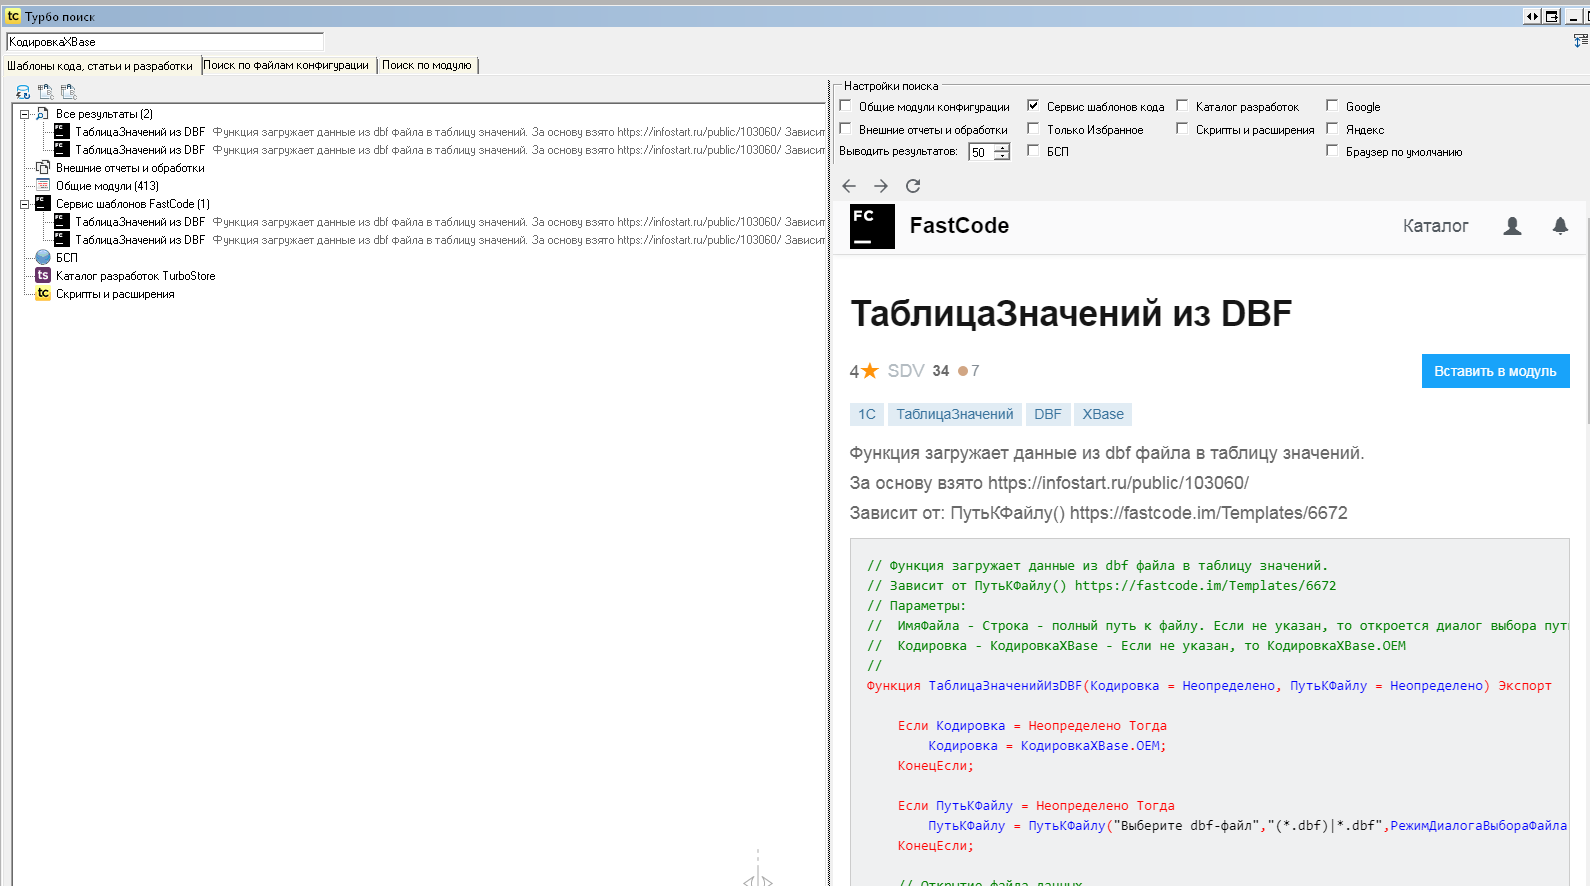 Image https://turboconf.ru/Content/Files/AC7F769DB50463FDCD3480828393DCA178BF349F/%D0%91%D1%83%D1%84%D0%B5%D1%80%20%D0%BE%D0%B1%D0%BC%D0%B5%D0%BD%D0%B001.png